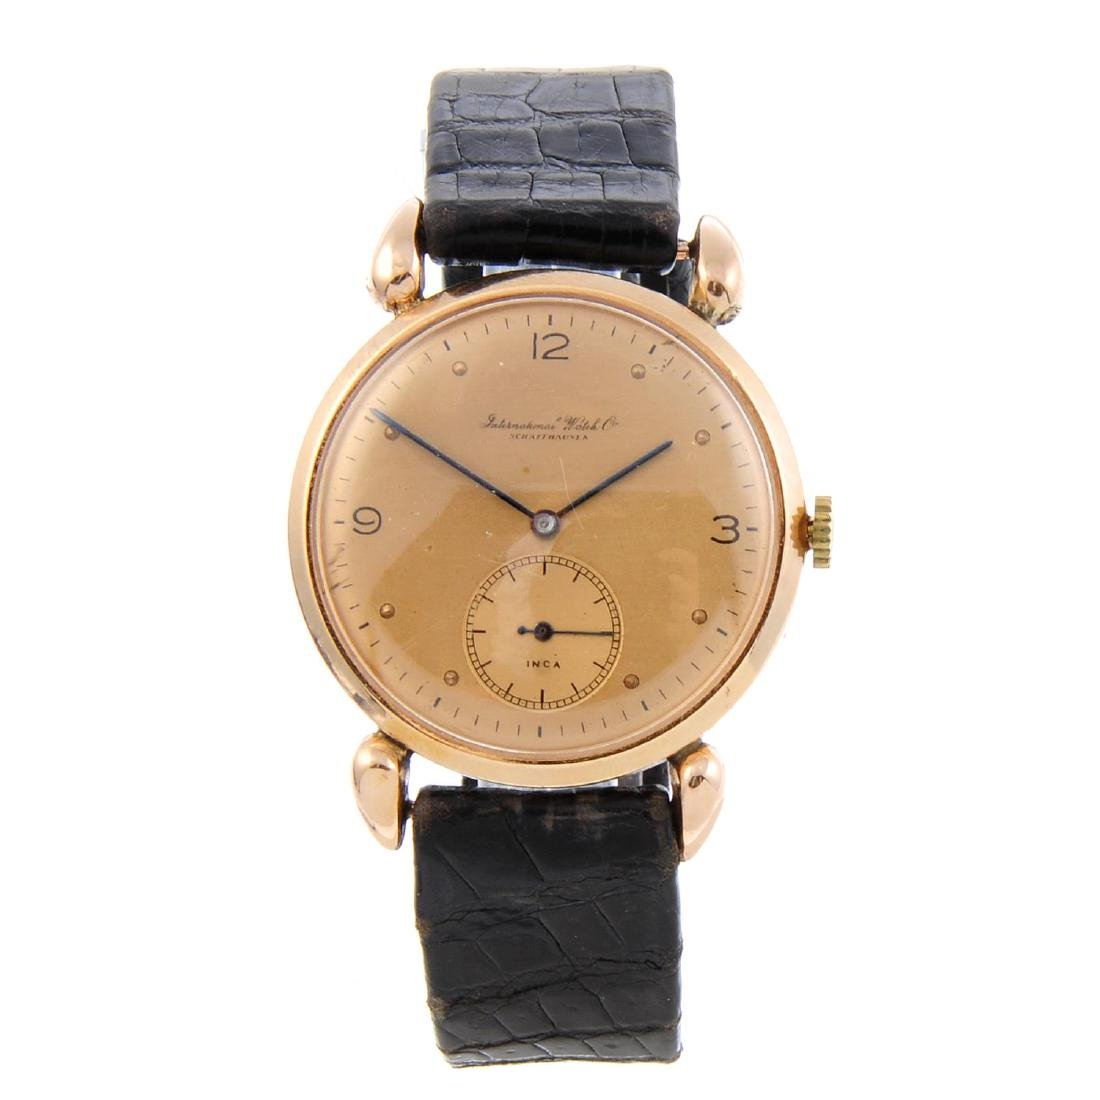 IWC - a gentleman's wrist watch. Rose metal case.